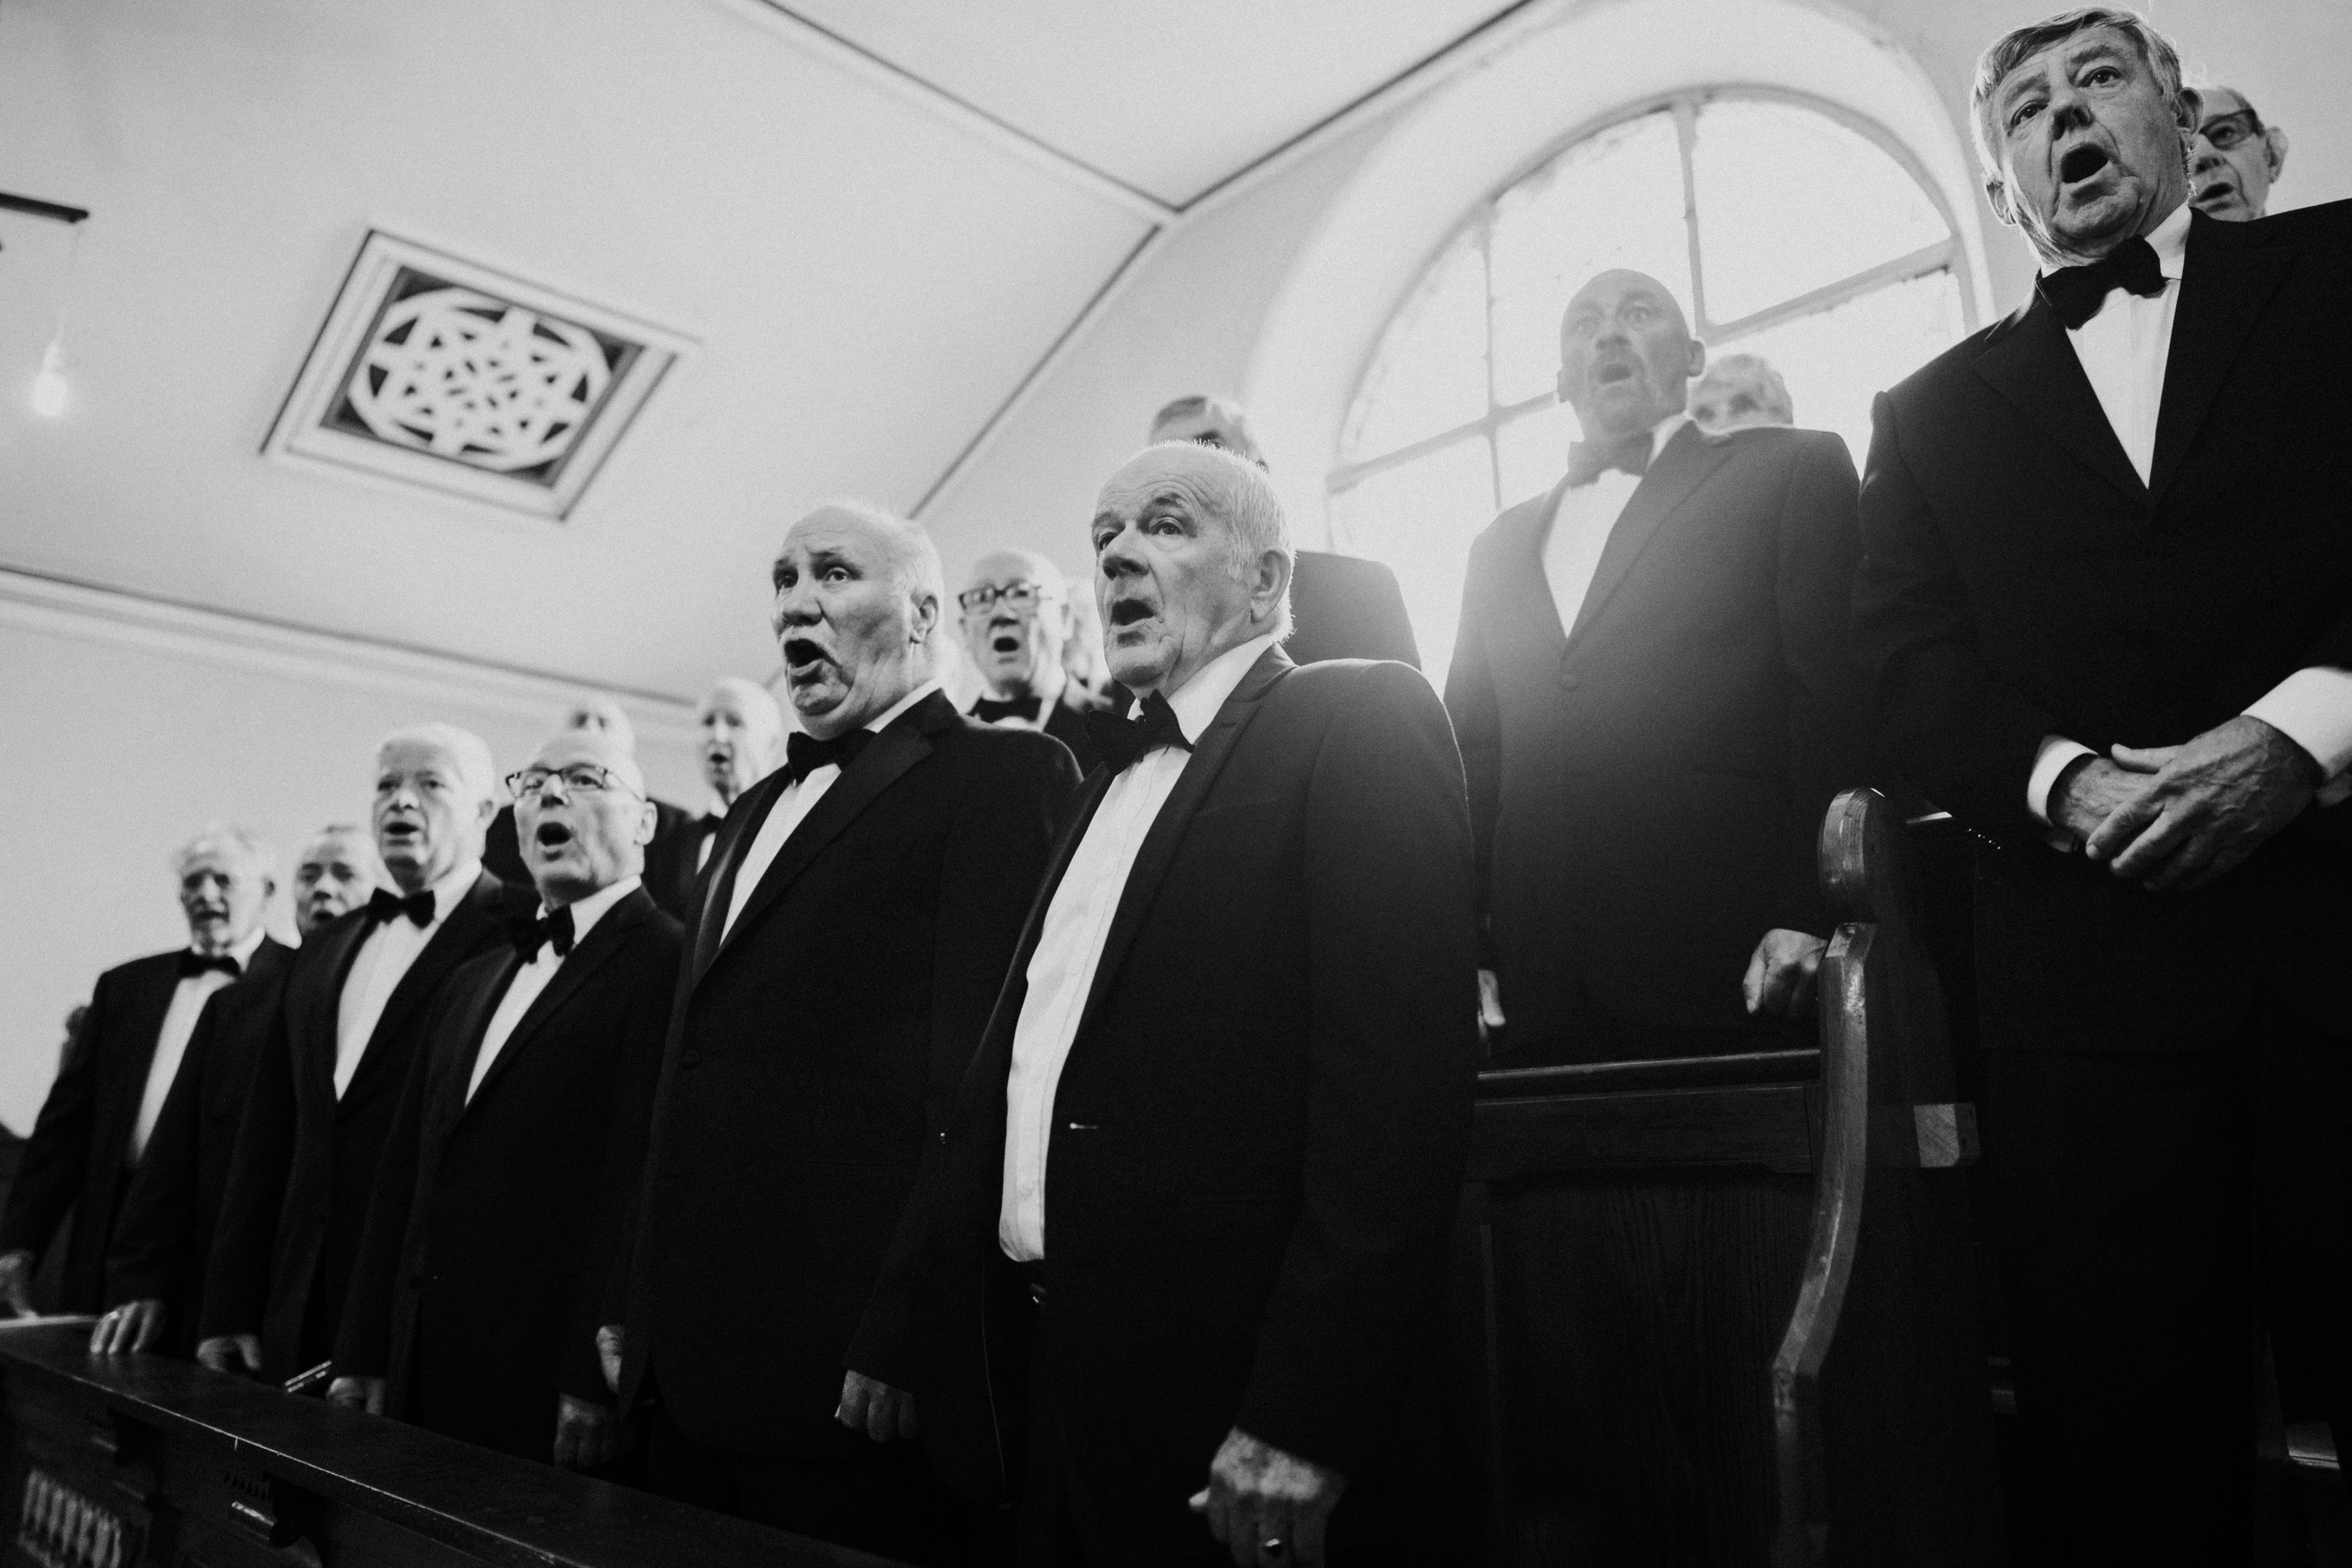 llantrisant male choir